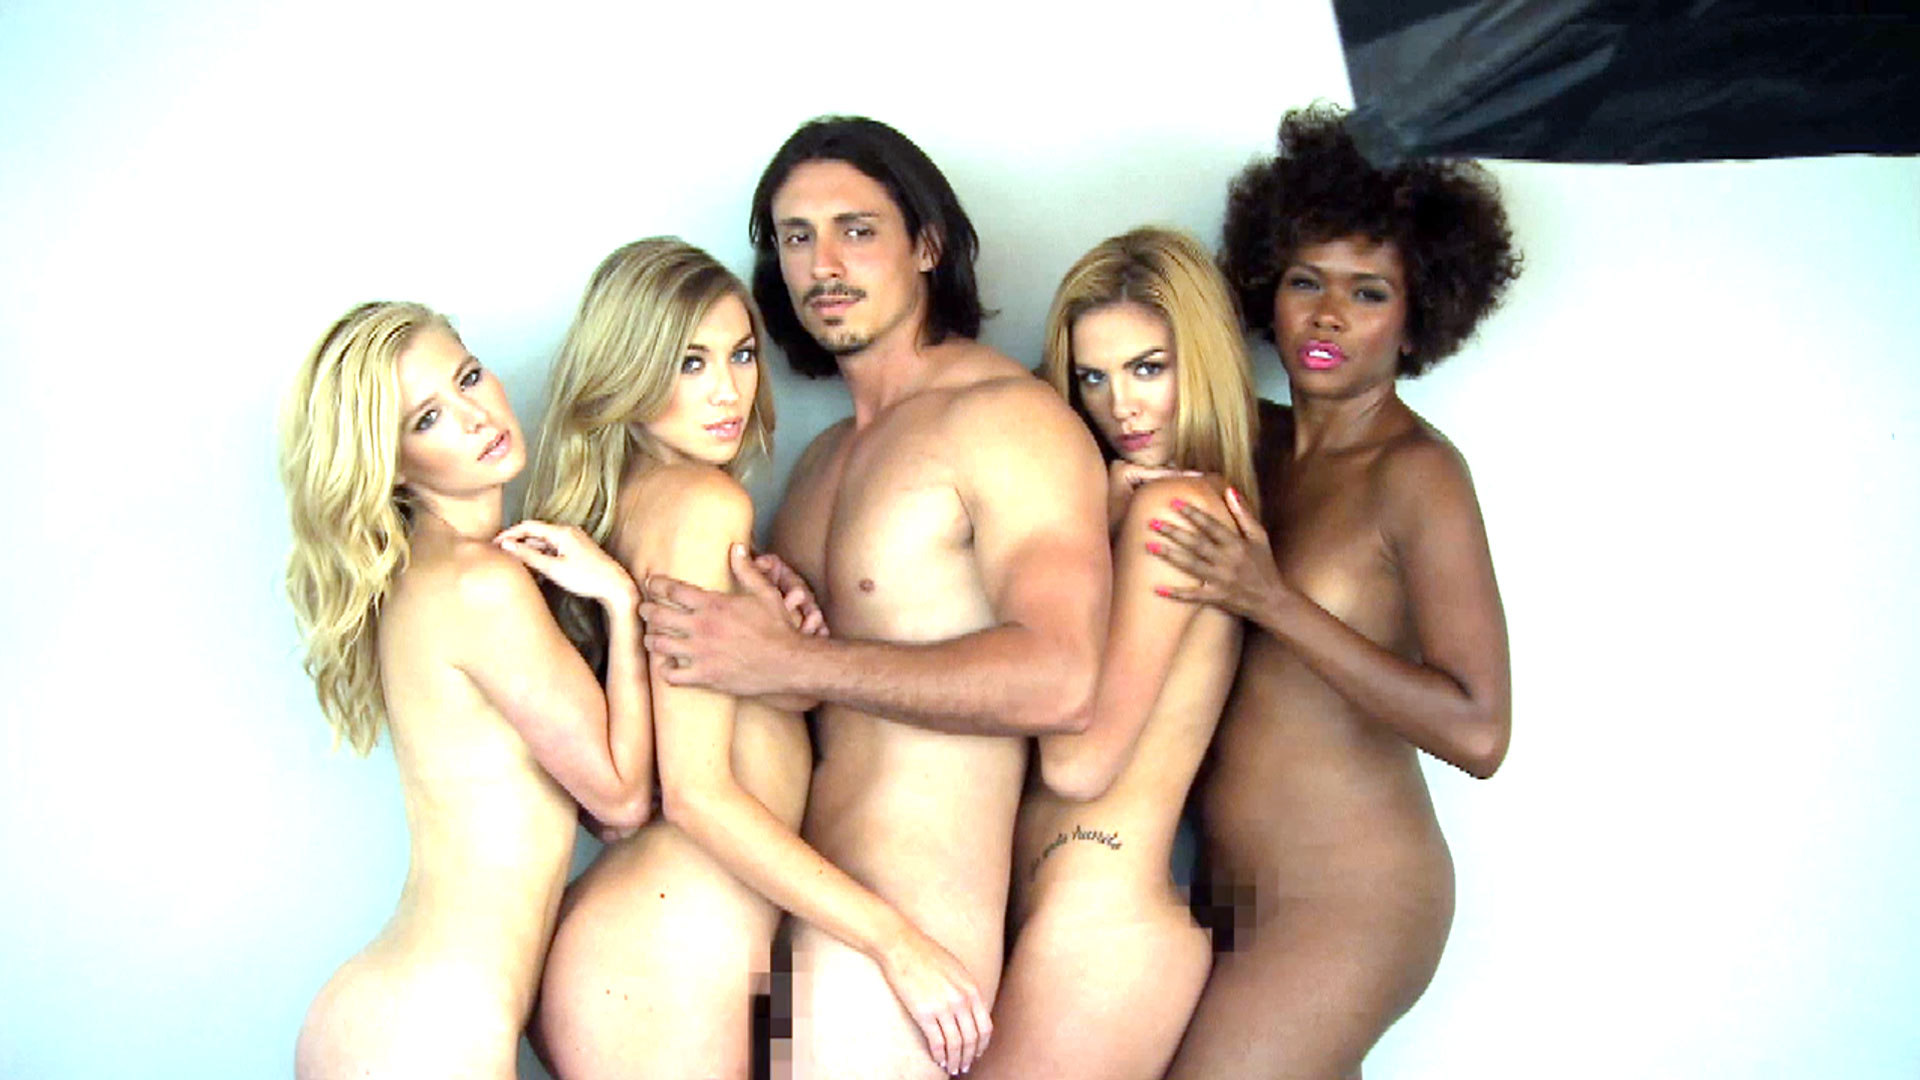 Nude of boardwalk empire